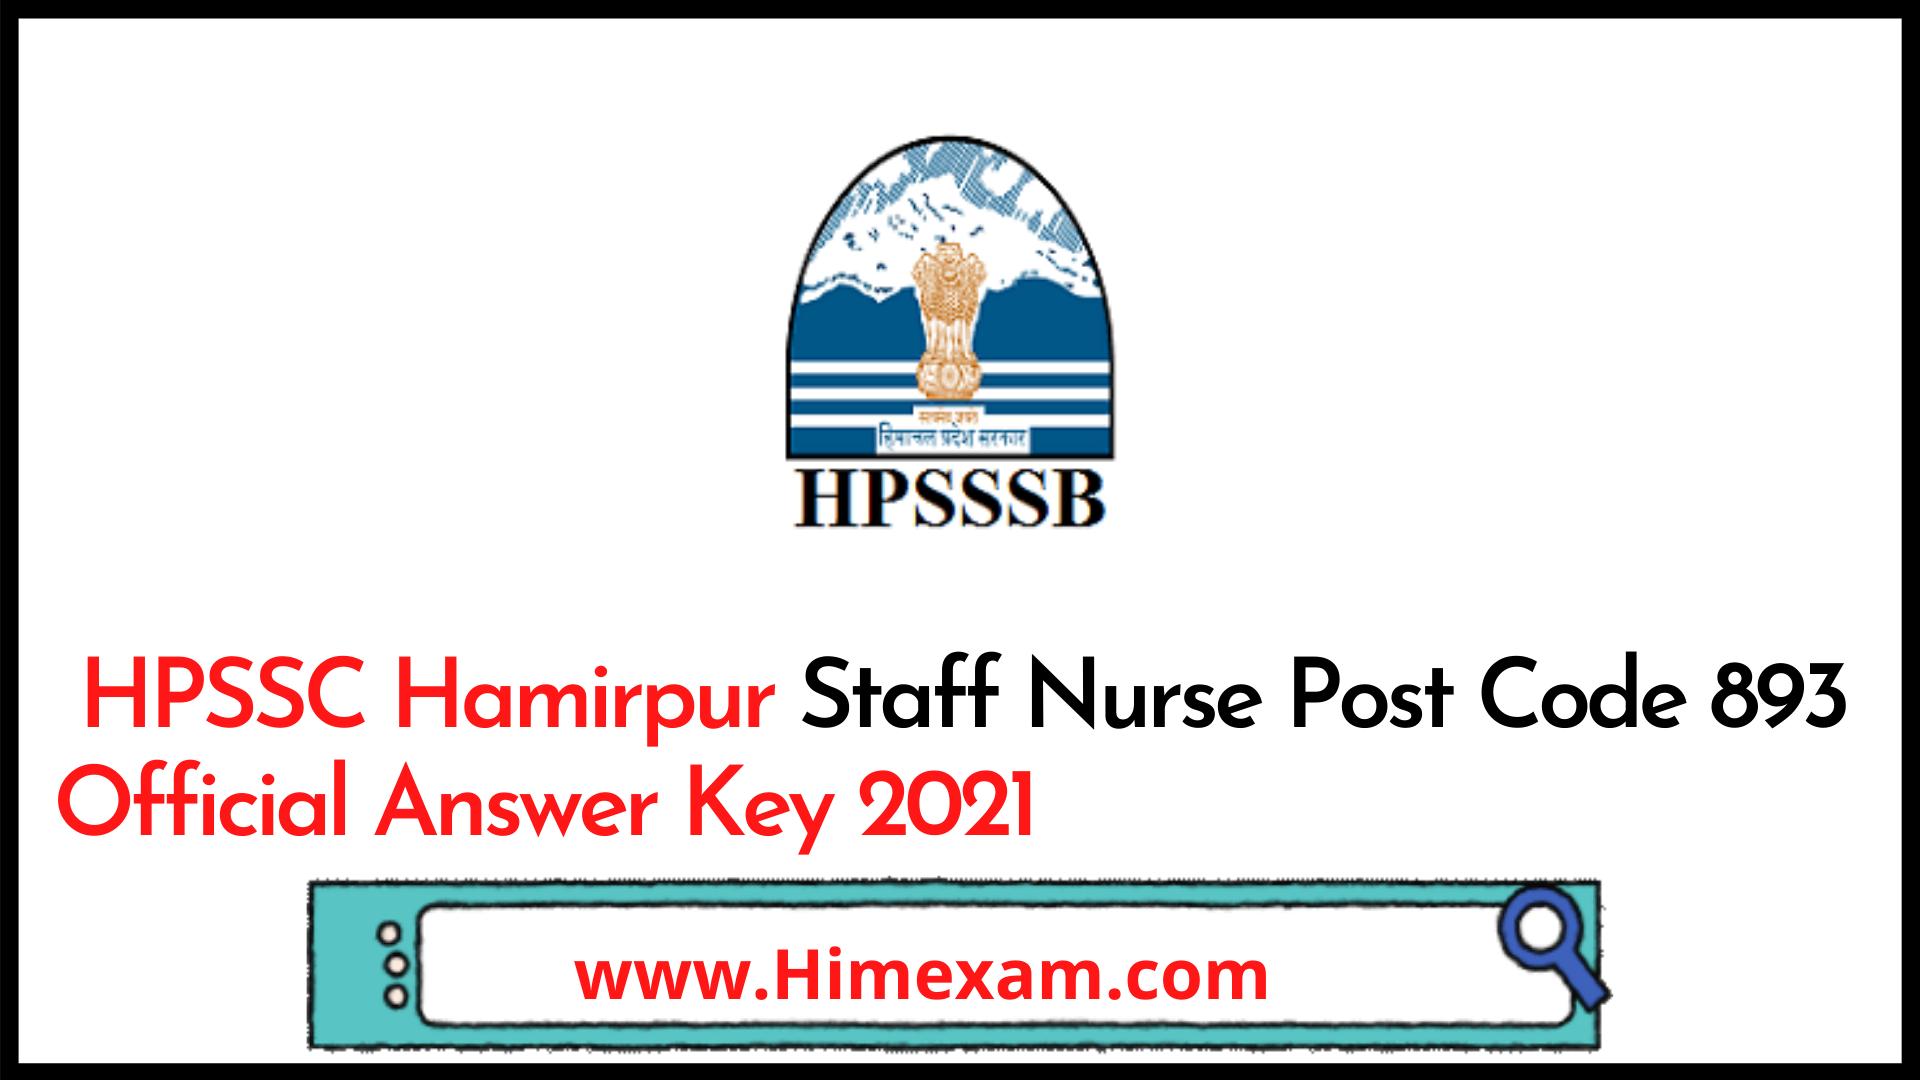 HPSSC Hamirpur Staff Nurse Post Code 893 Official Answer Key 2021